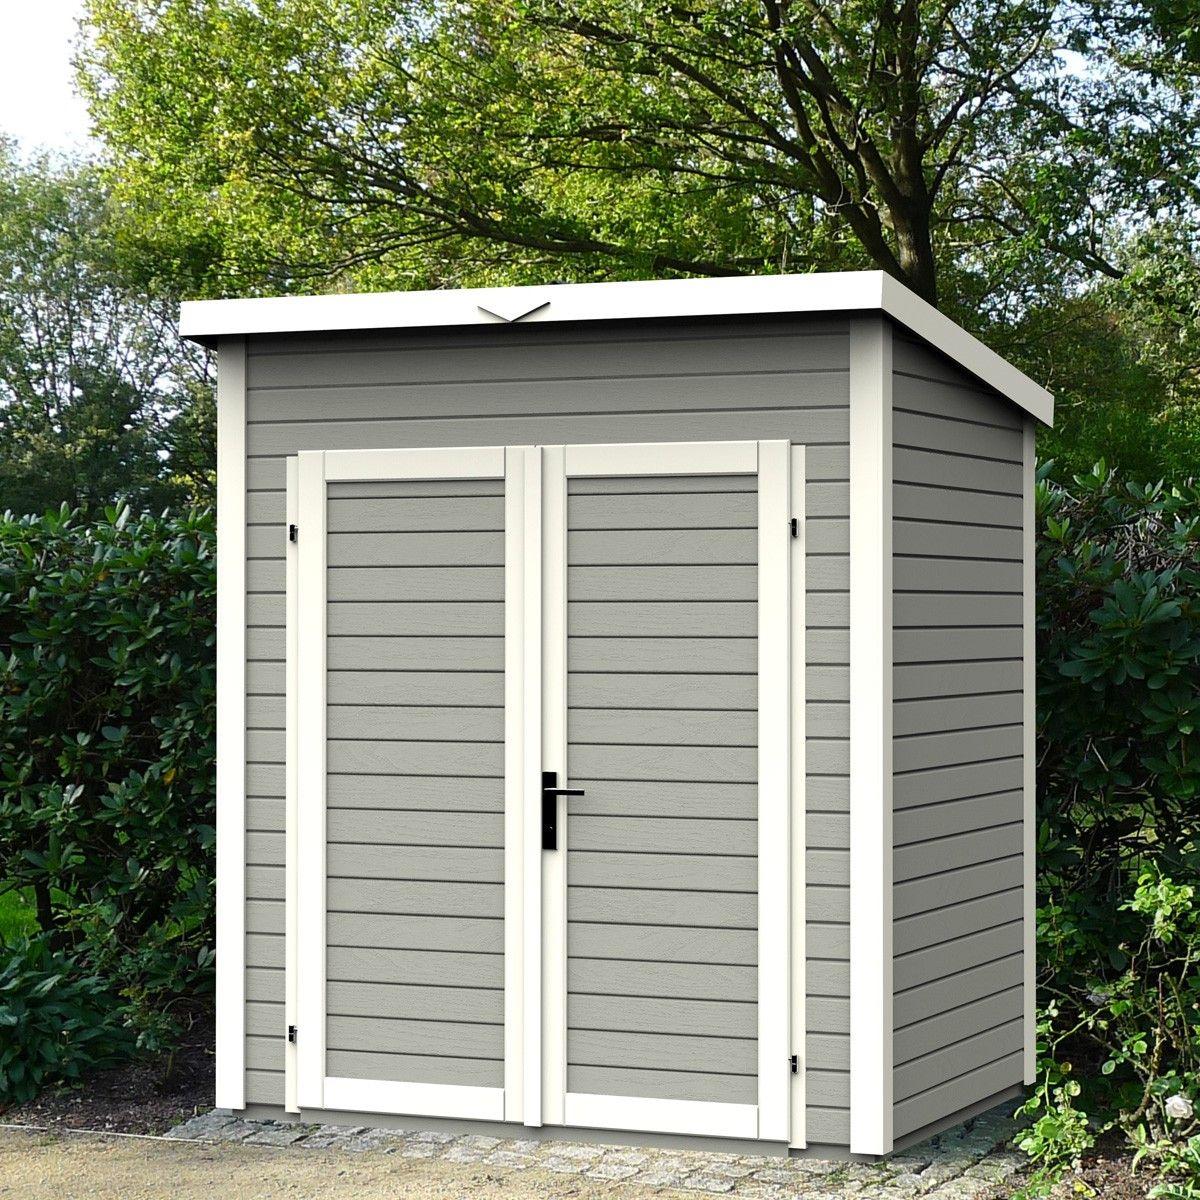 Abri de jardin skur1 1 75x1 20x2 33 coloris gris lekingstore prix 899 contactez nous au - Baraque de jardin ...